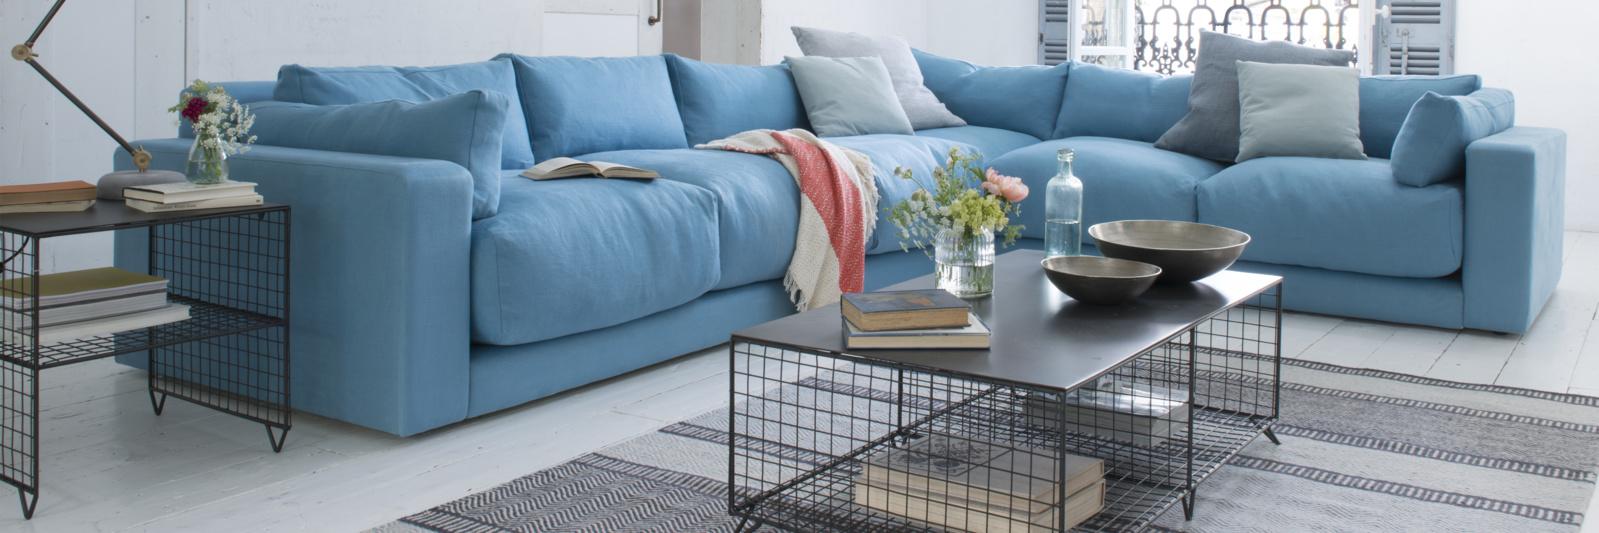 Extra Large Sofas   British-Made Sofas   Loaf